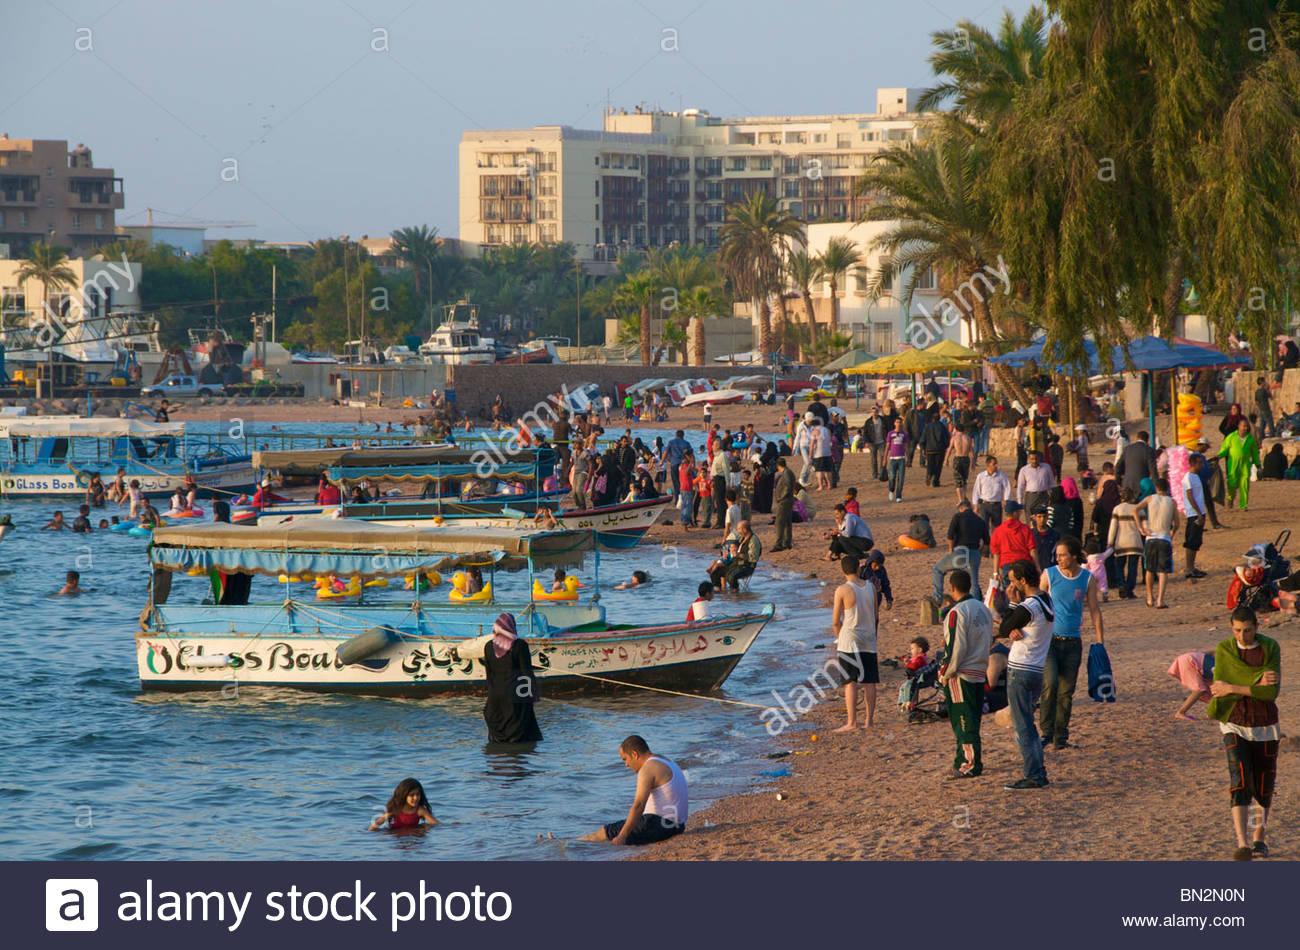 Under Stairs Public Beach Aqaba Jordan Stock Photo 30178533 Alamy